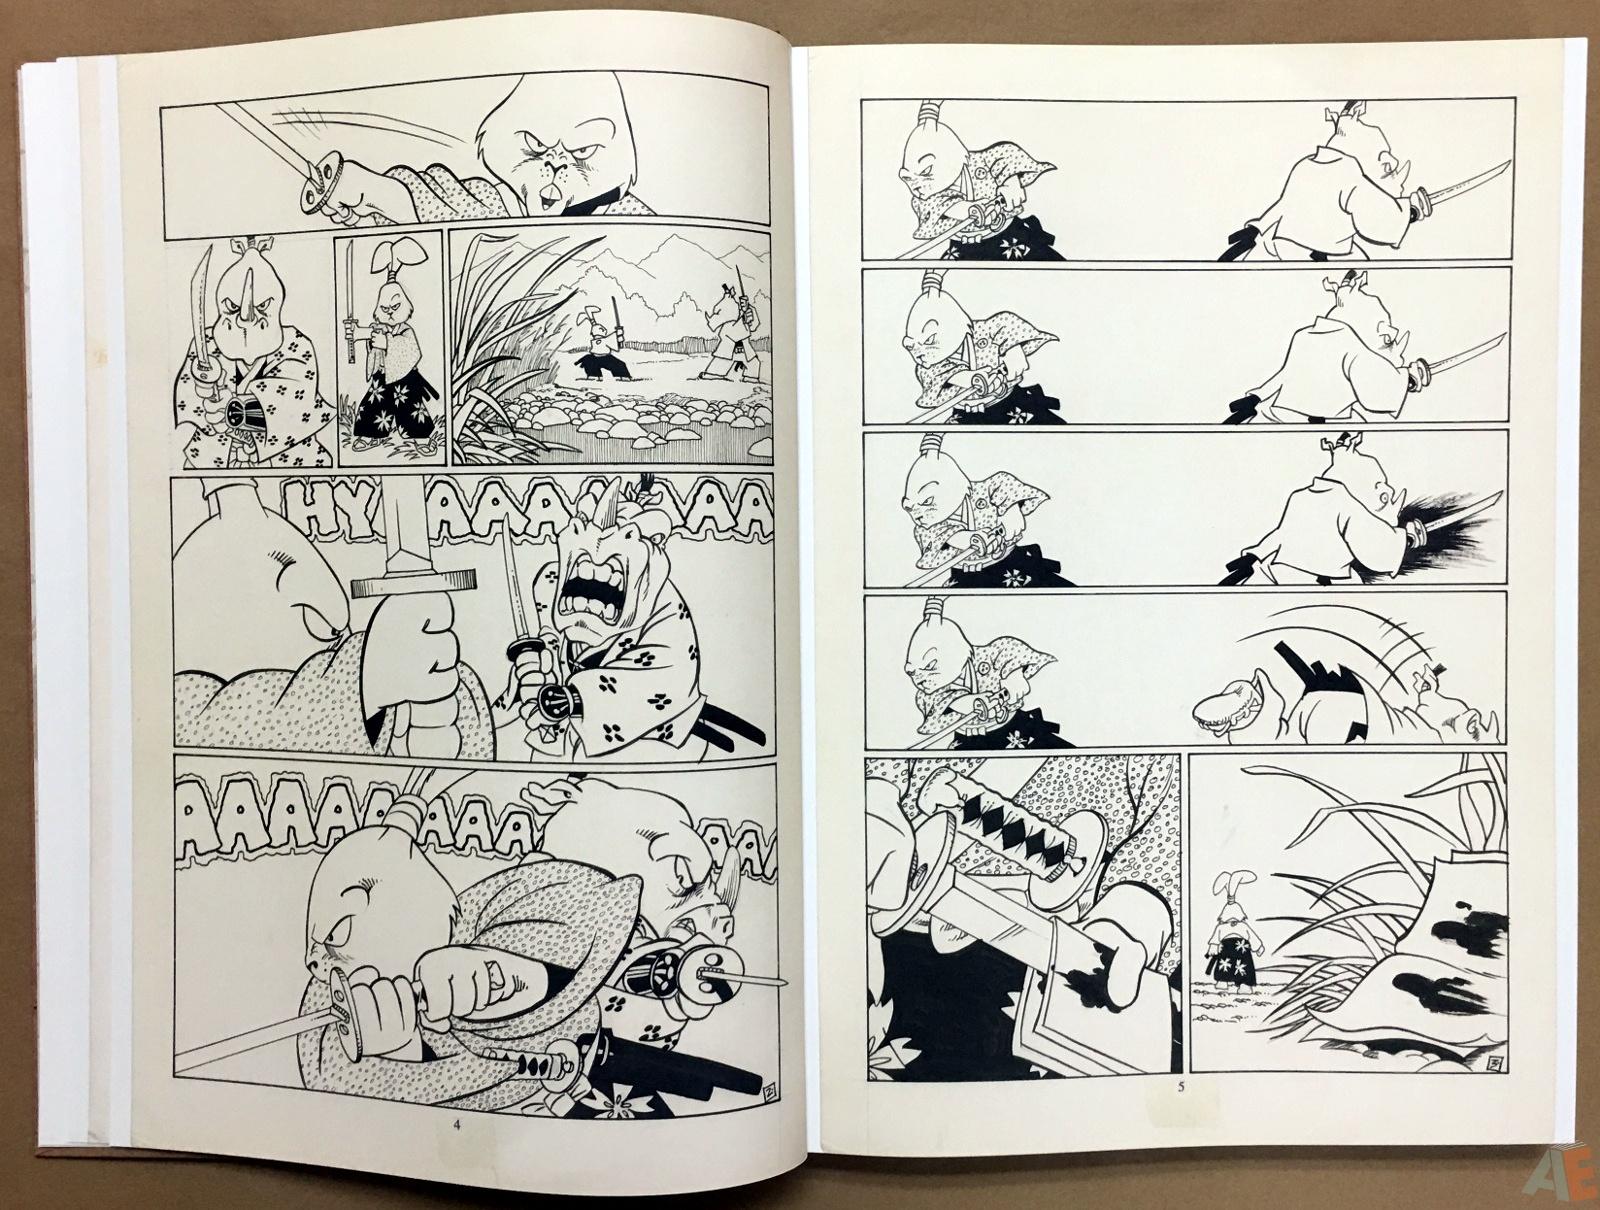 Usagi Yojimbo: Samurai and Other Stories Gallery Edition 10